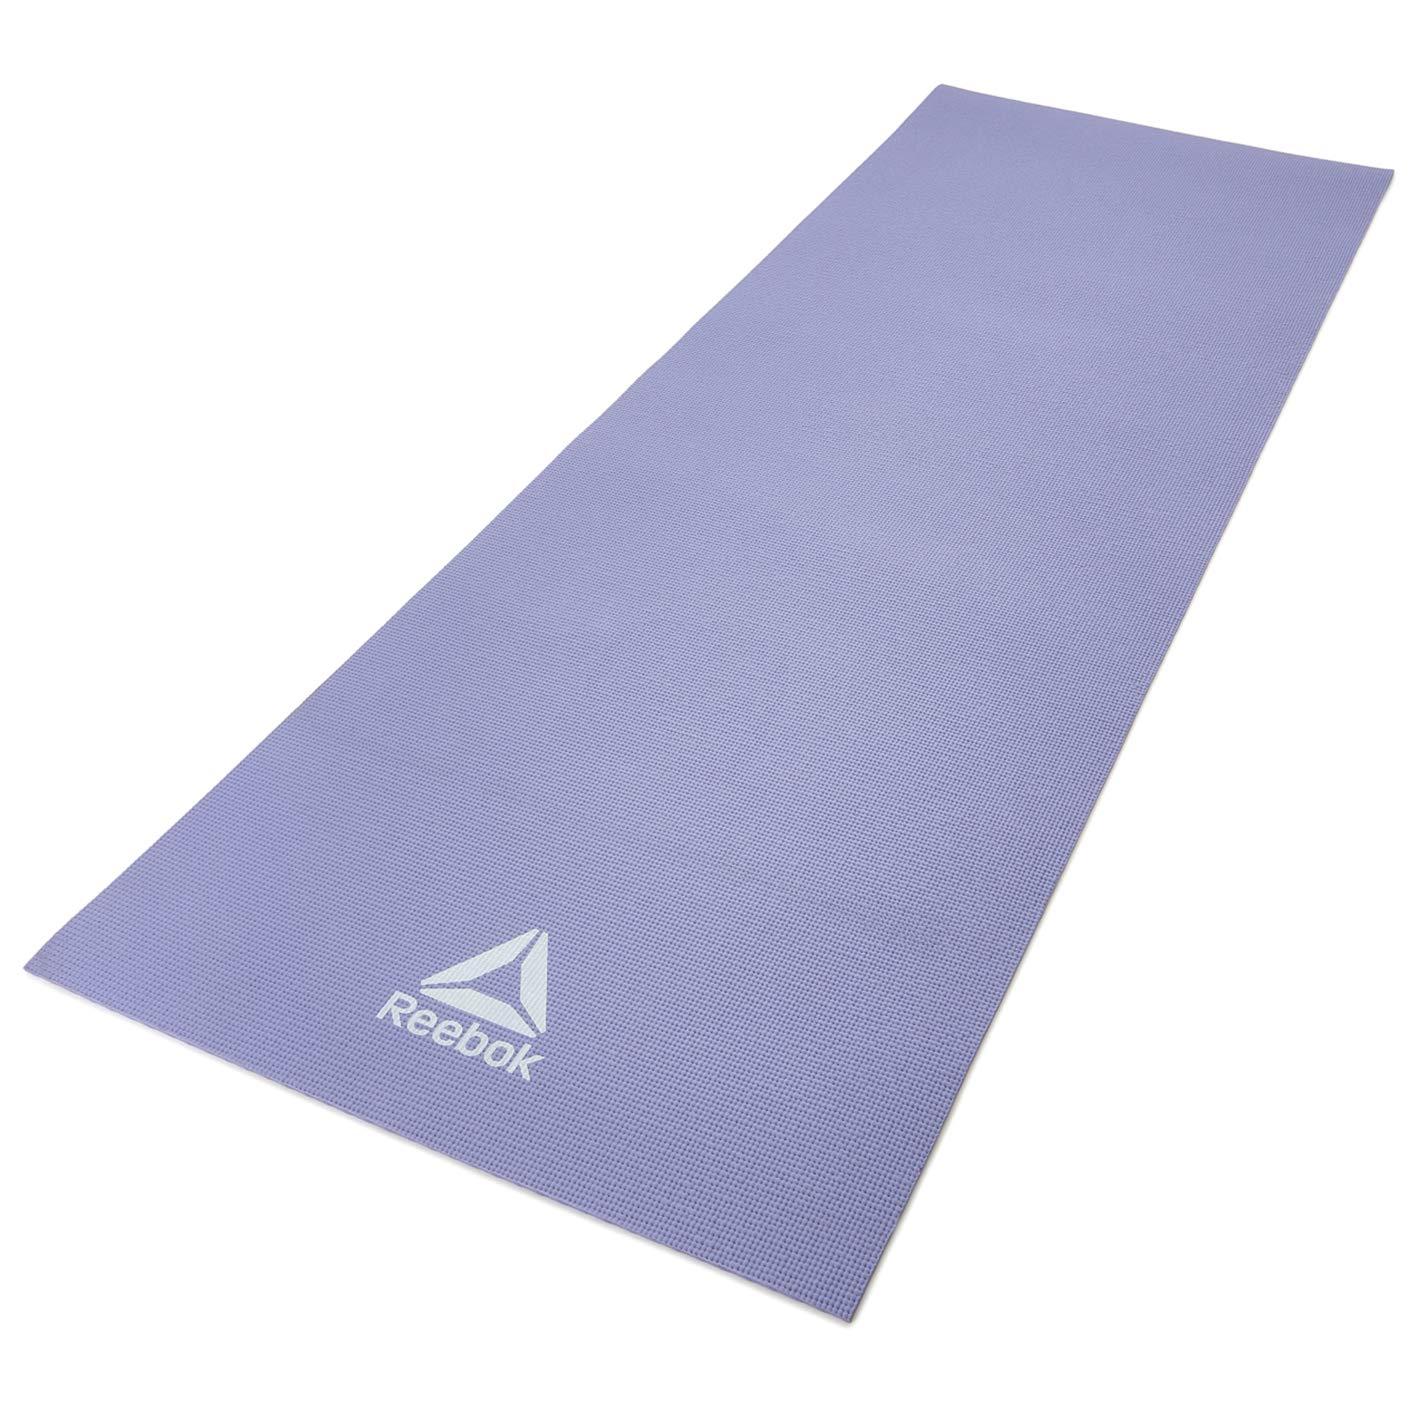 Reebok RAYG-11022PL Esterilla de Yoga 1c4a11b85aff